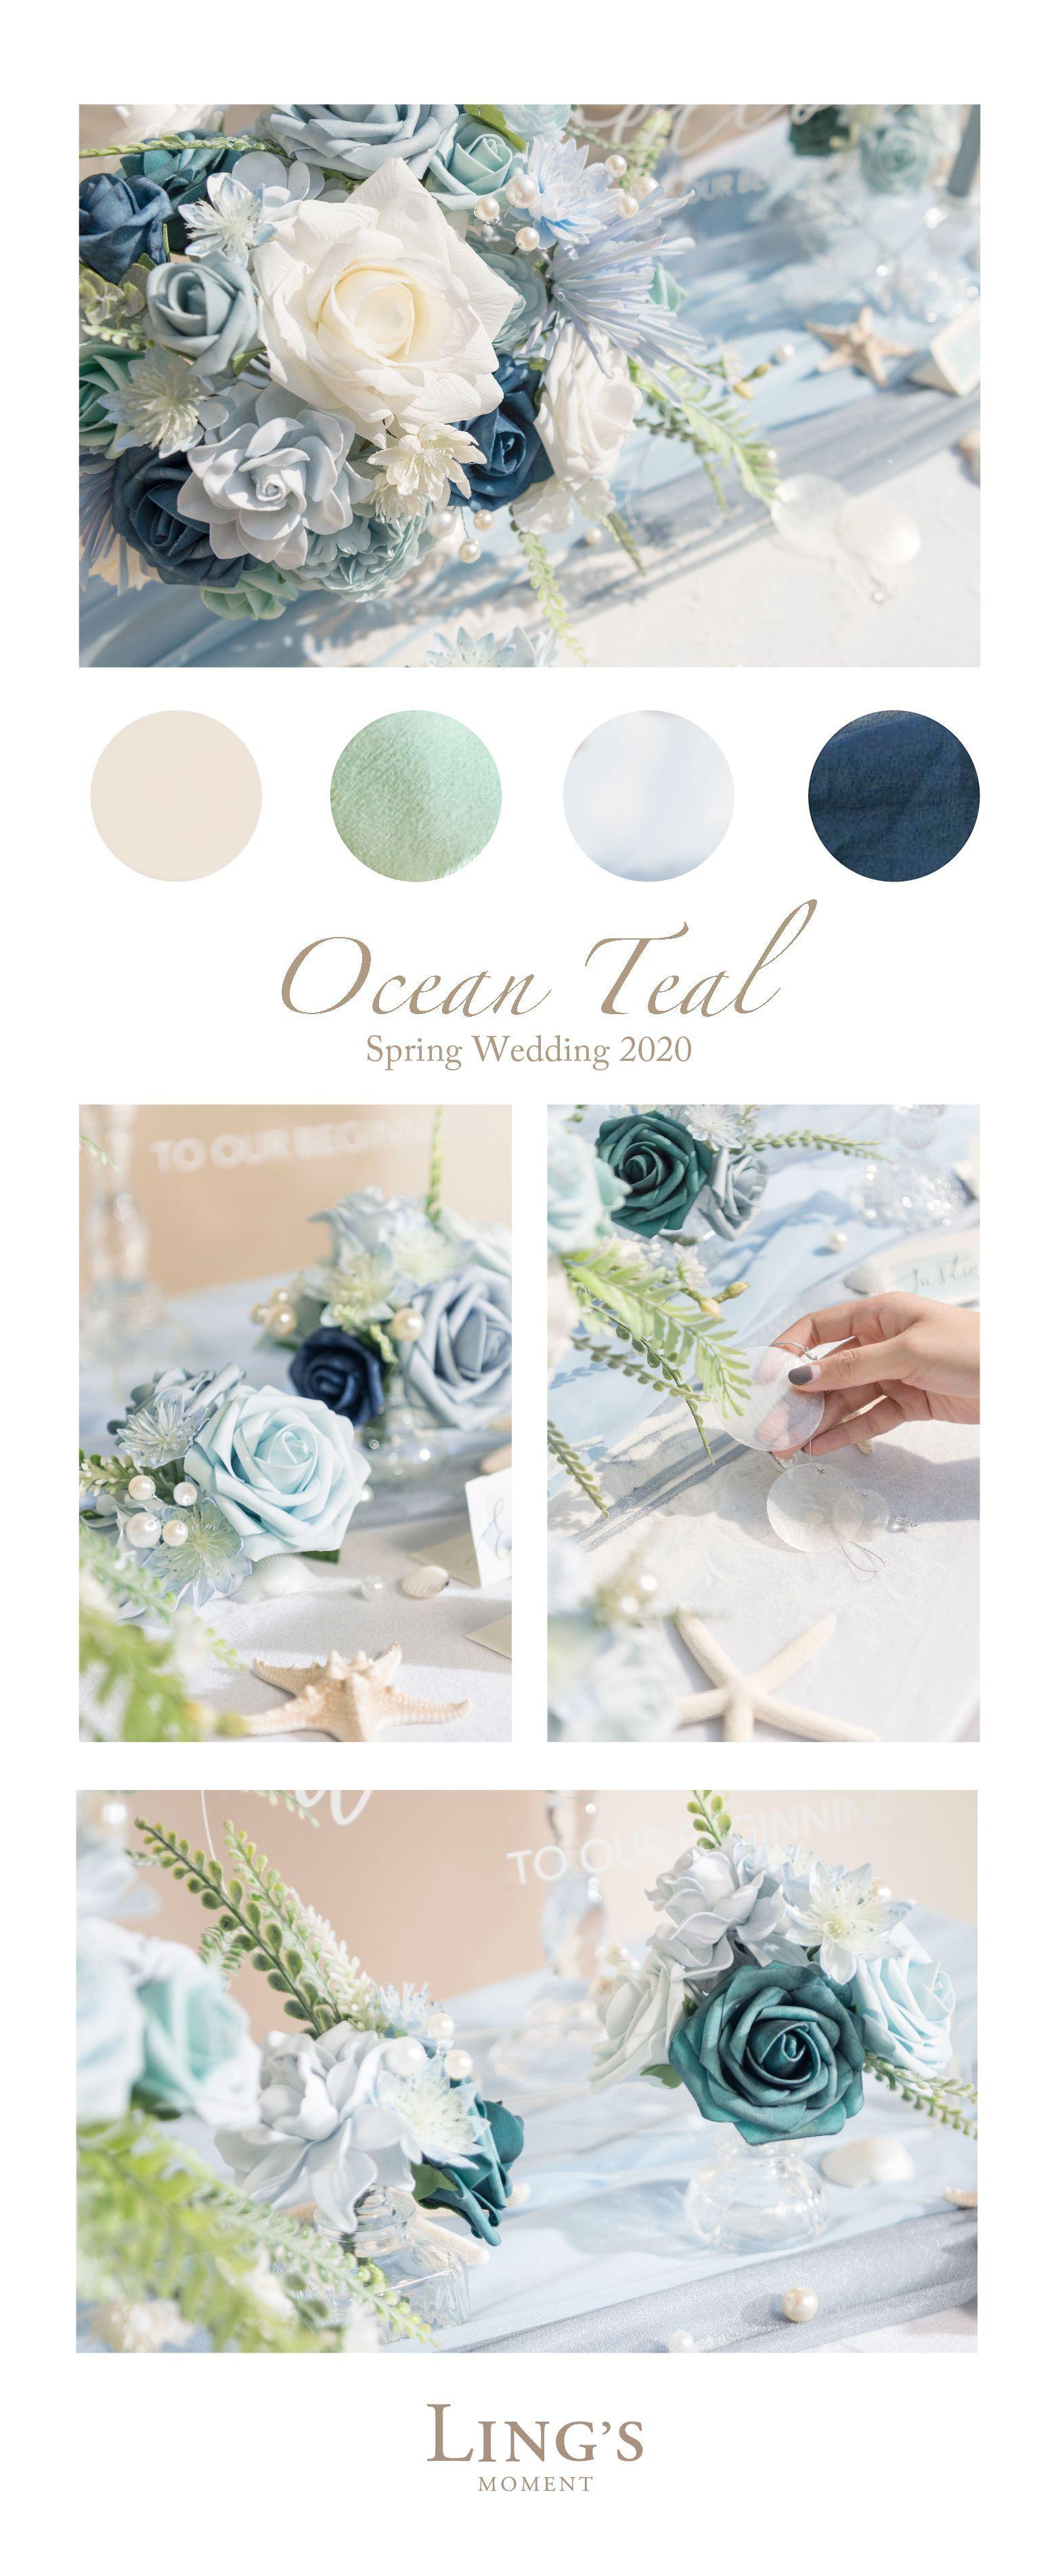 Spring Wedding 2020 - Ocean Teal Wedding Decor, Flowers Combo 10% Off Now!